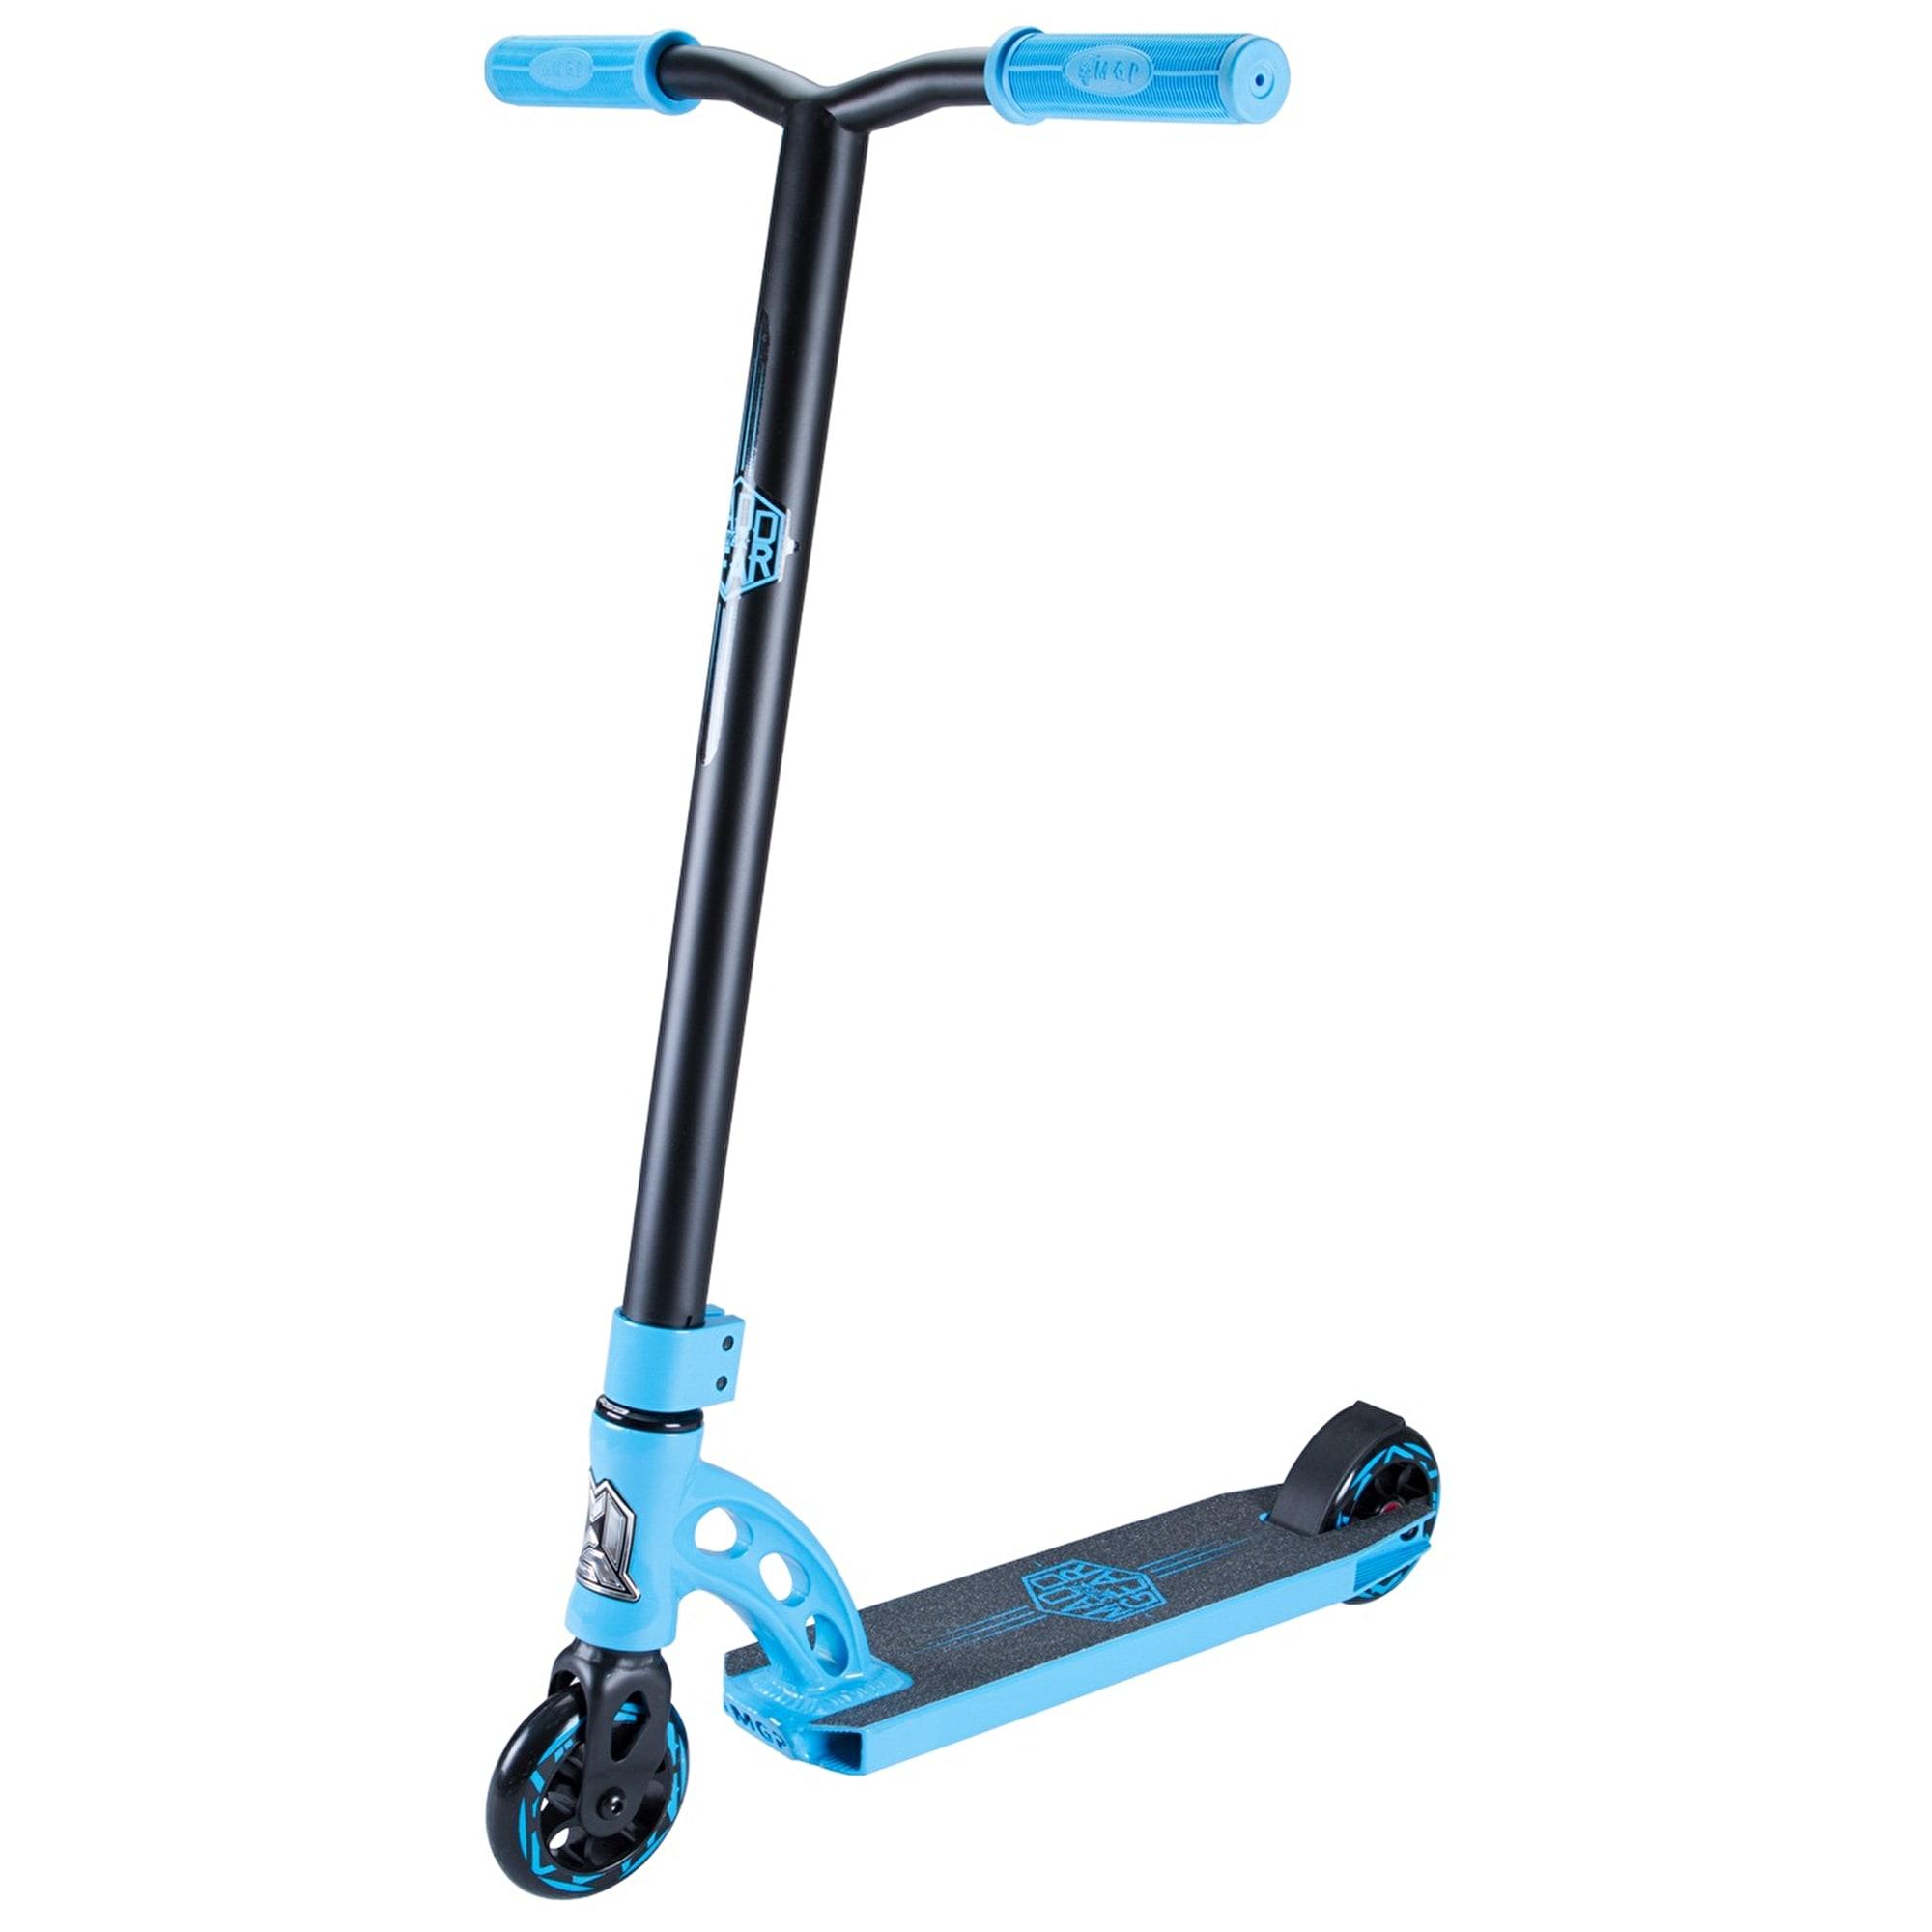 MGP VX7 Mini Pro scooter, Belhaven Bikes, Dunbar, East Lothian